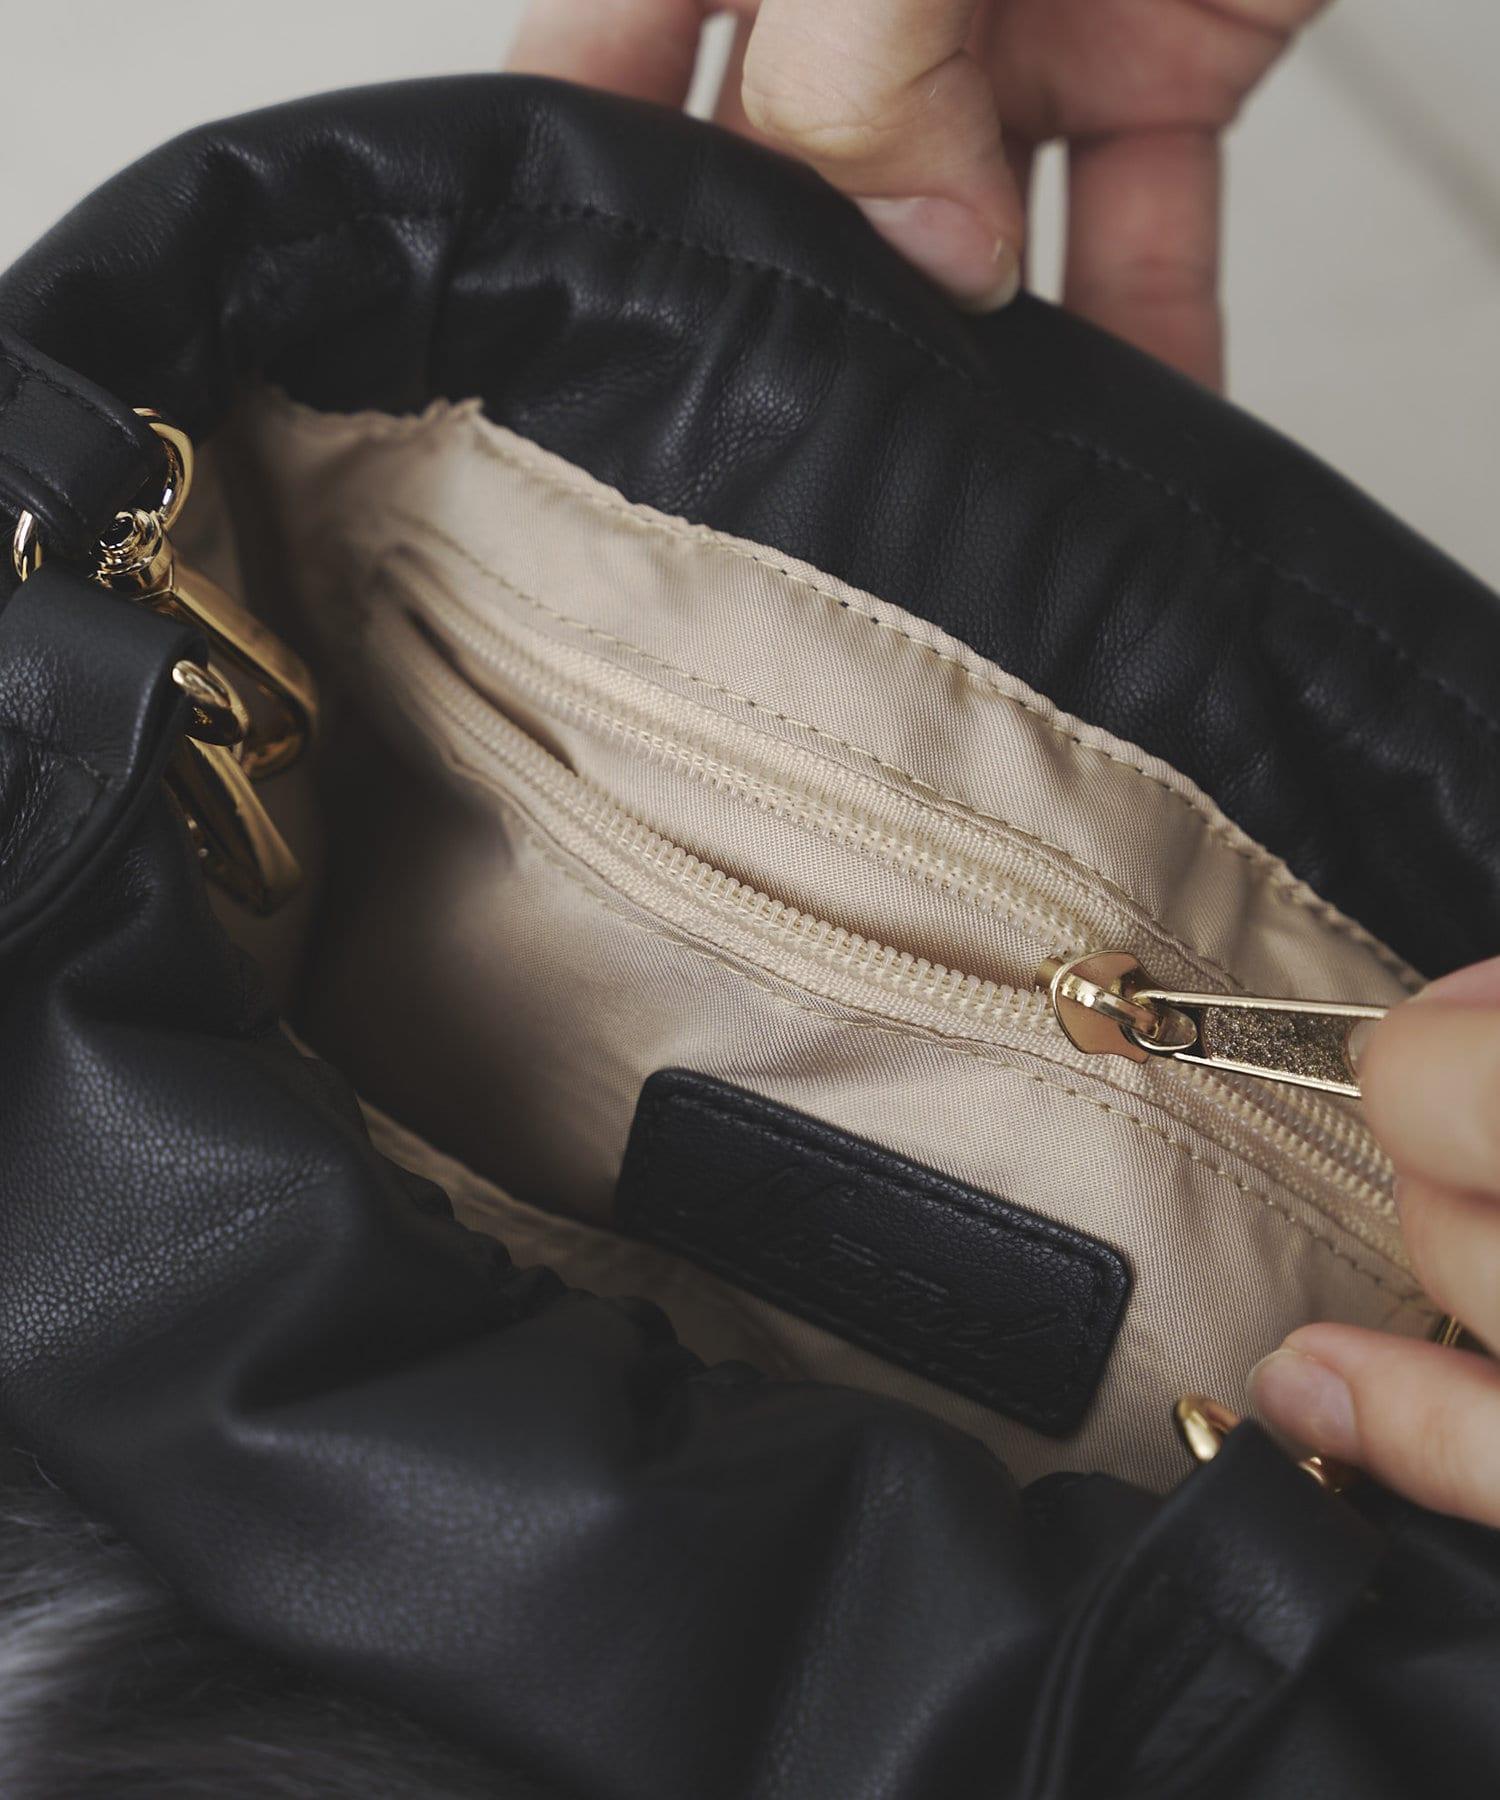 mona Belinda(モナ ベリンダ) 《WEB限定》エコファー巾着2WAYショルダーバッグ